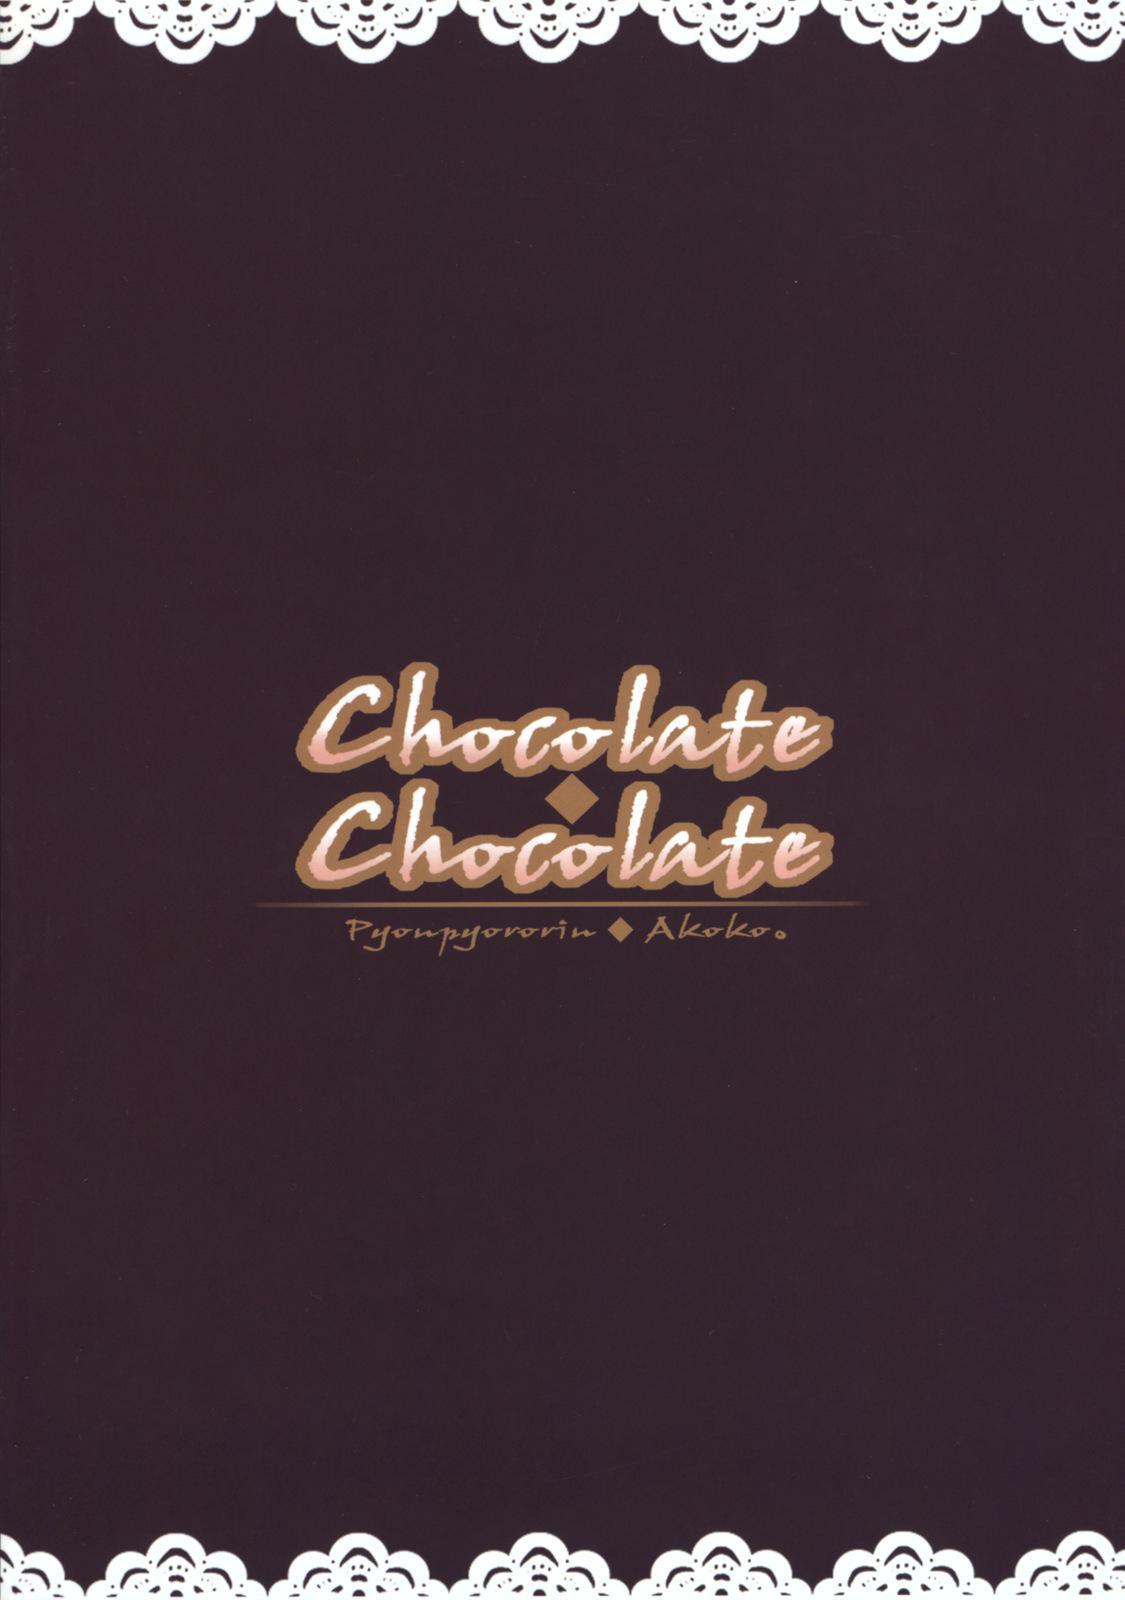 Chocolate-Chocolate 17